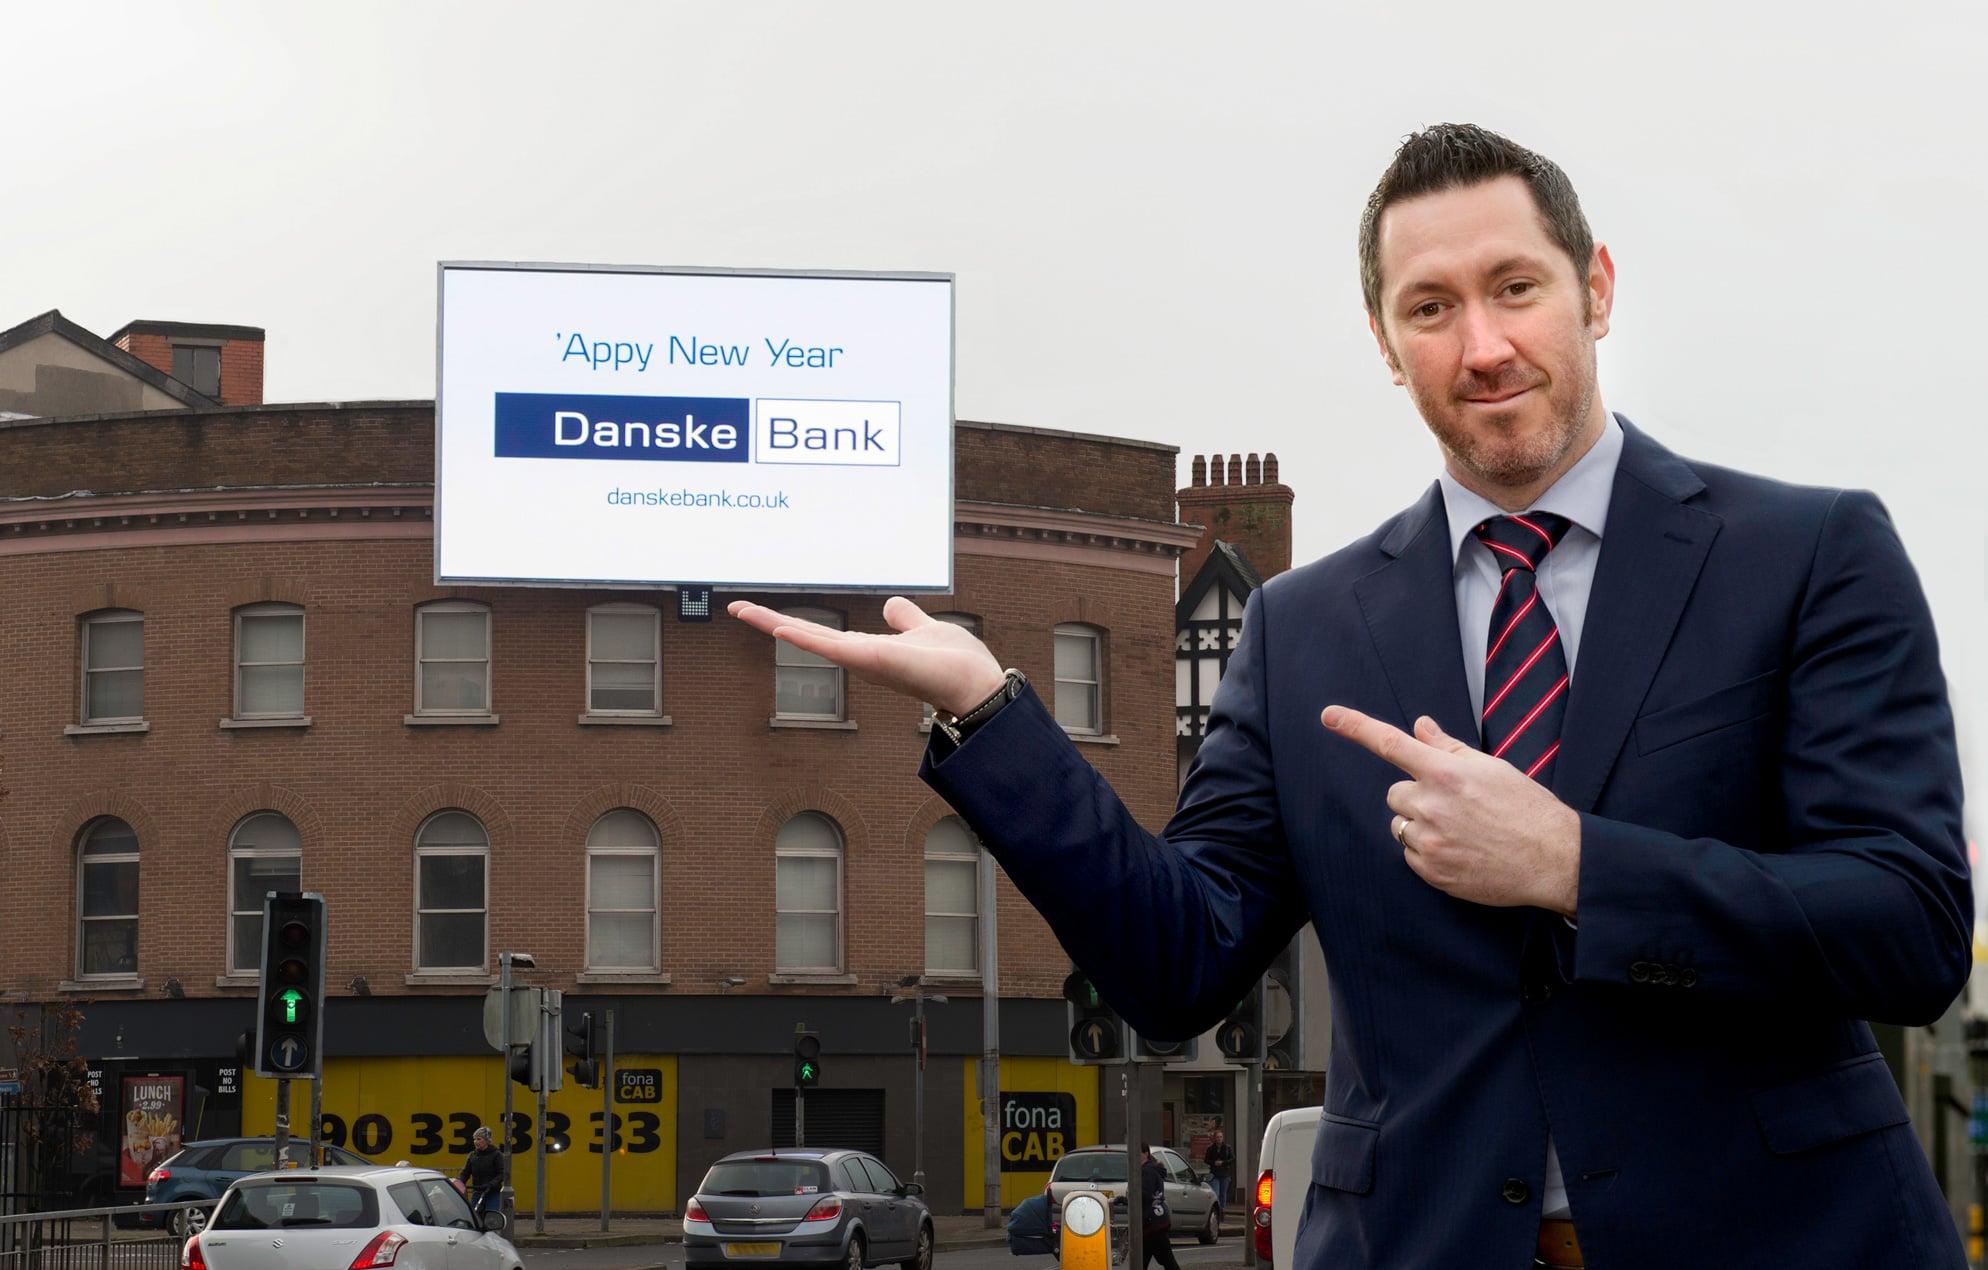 Andrew Fairfowl, Director of Blazin Digital launches huge LED billboard in Belfast City